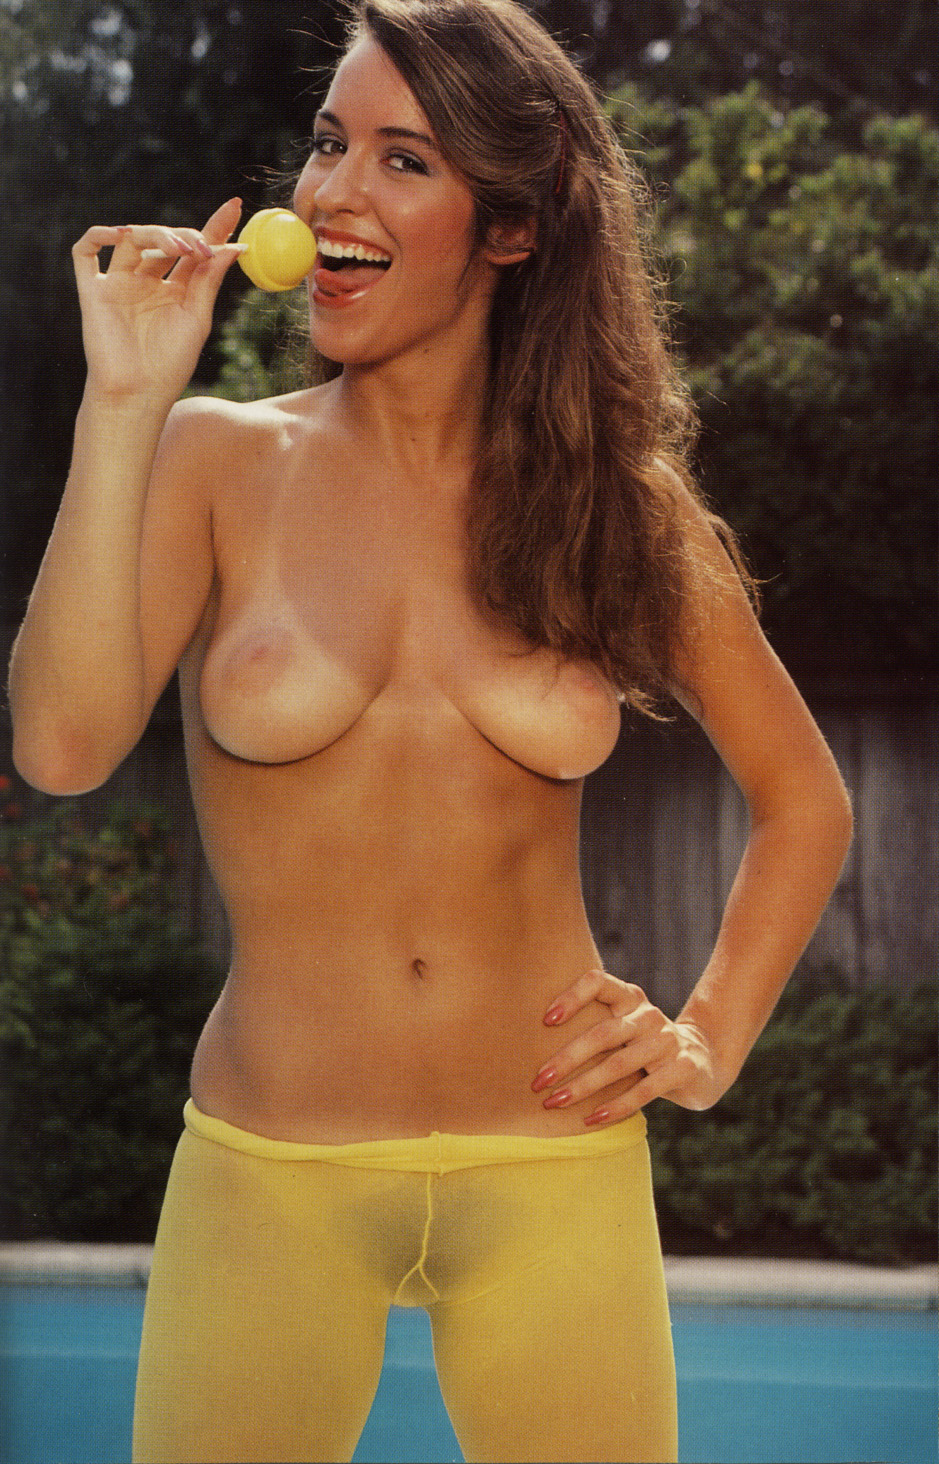 Pornstar Tina Ross aka Lauren Wilde 01.jpg